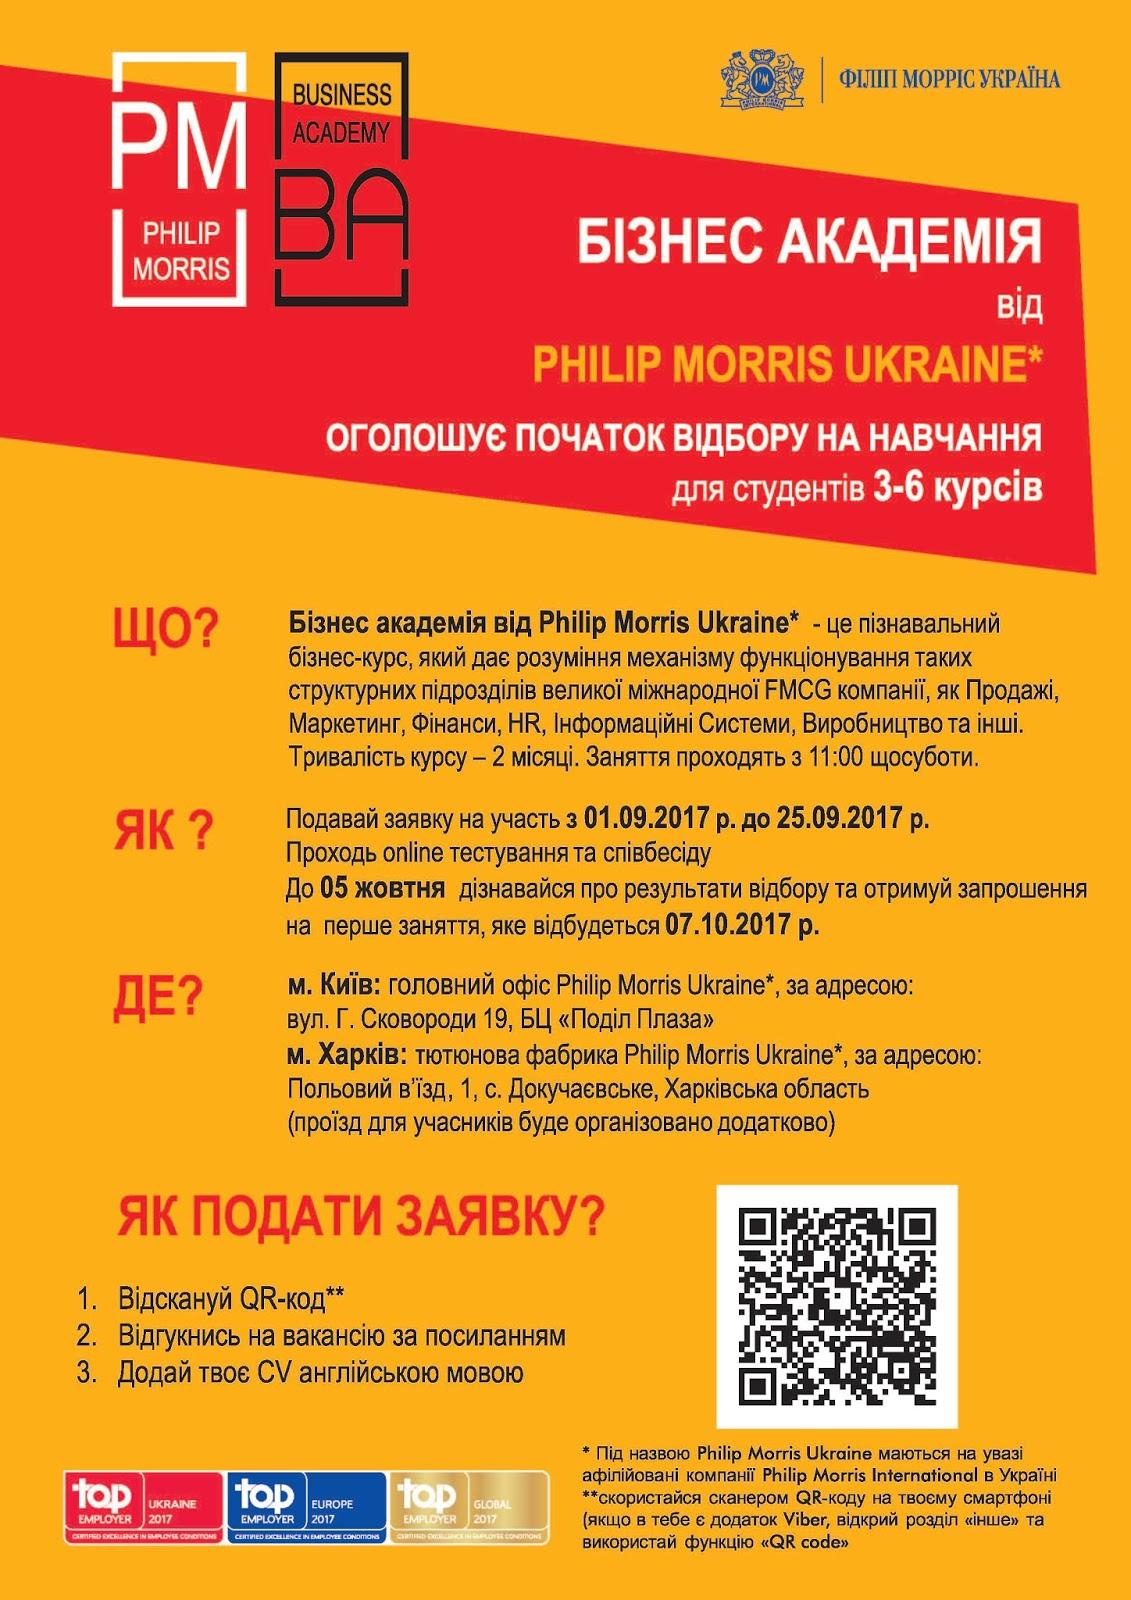 Бізнес академія від Philip Morris Ukraine